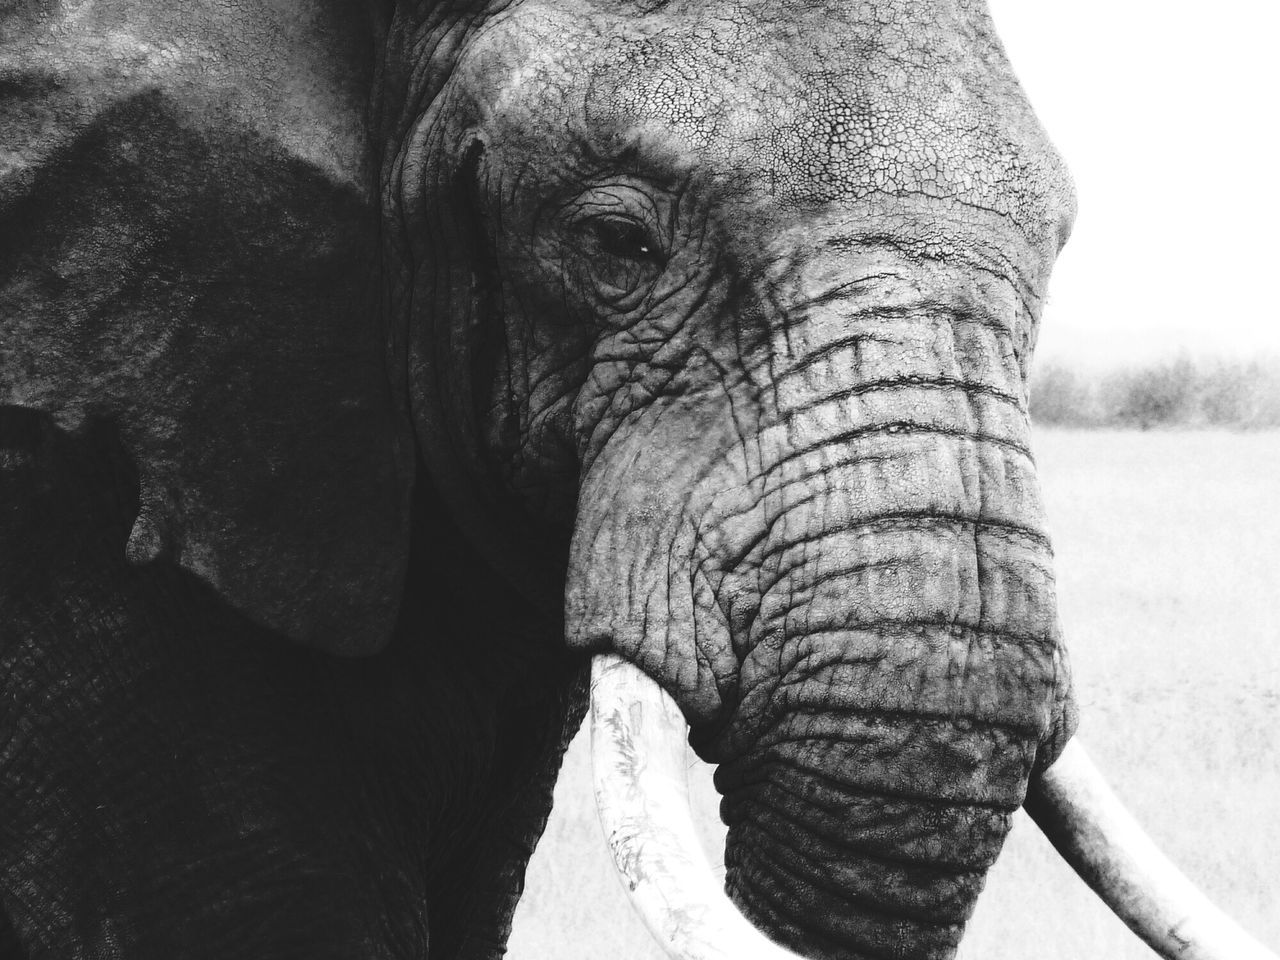 Blackandwhite Photography Africa Safari Elephants Kenya Animal_collection Animal Portrait EyeEm Best Shots - Black + White EyeEm Animal Lover EyeEm Best Shots